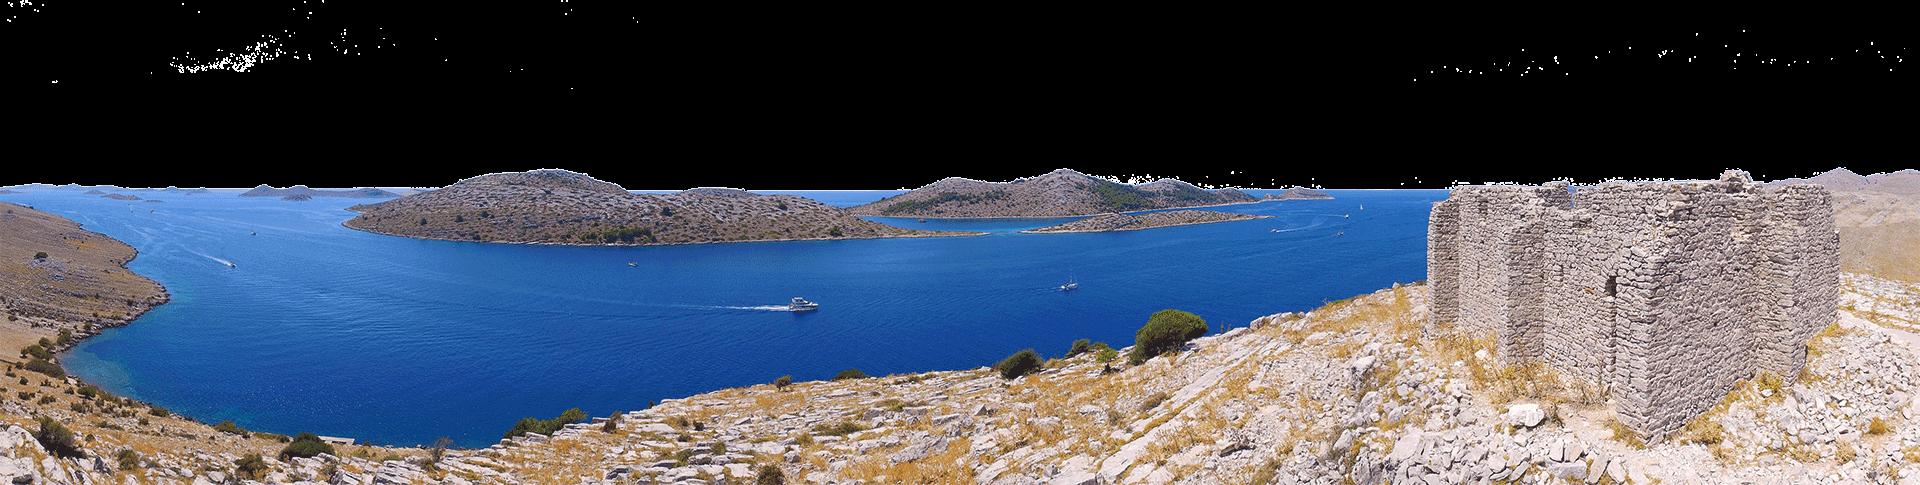 Archipelago Tours Daily boat tour Sibenik - Contact us photo